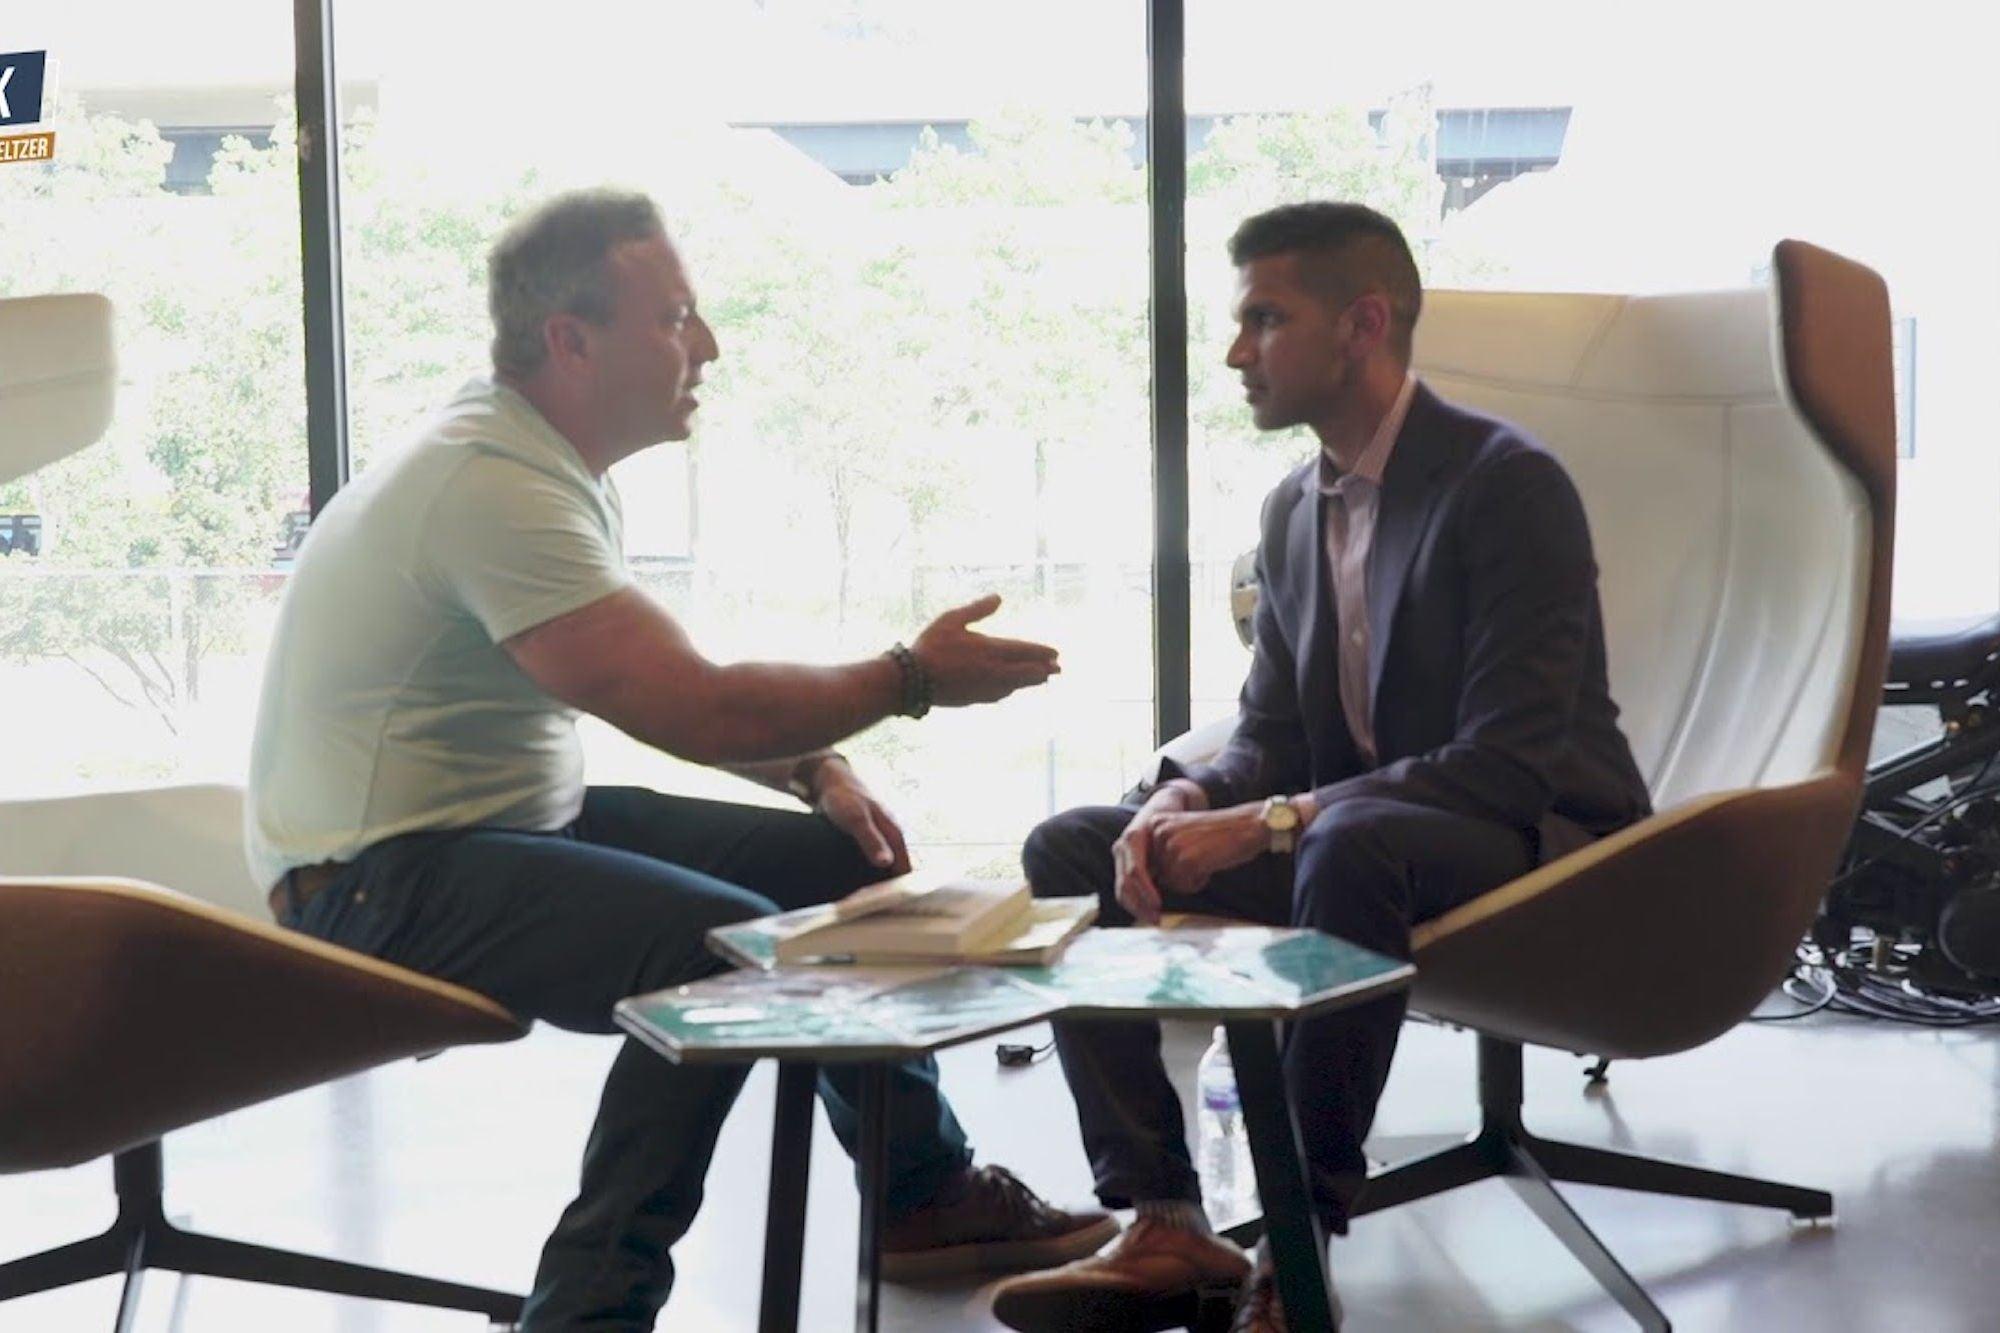 How This Entrepreneur Landed a Deal on 'Shark Tank'